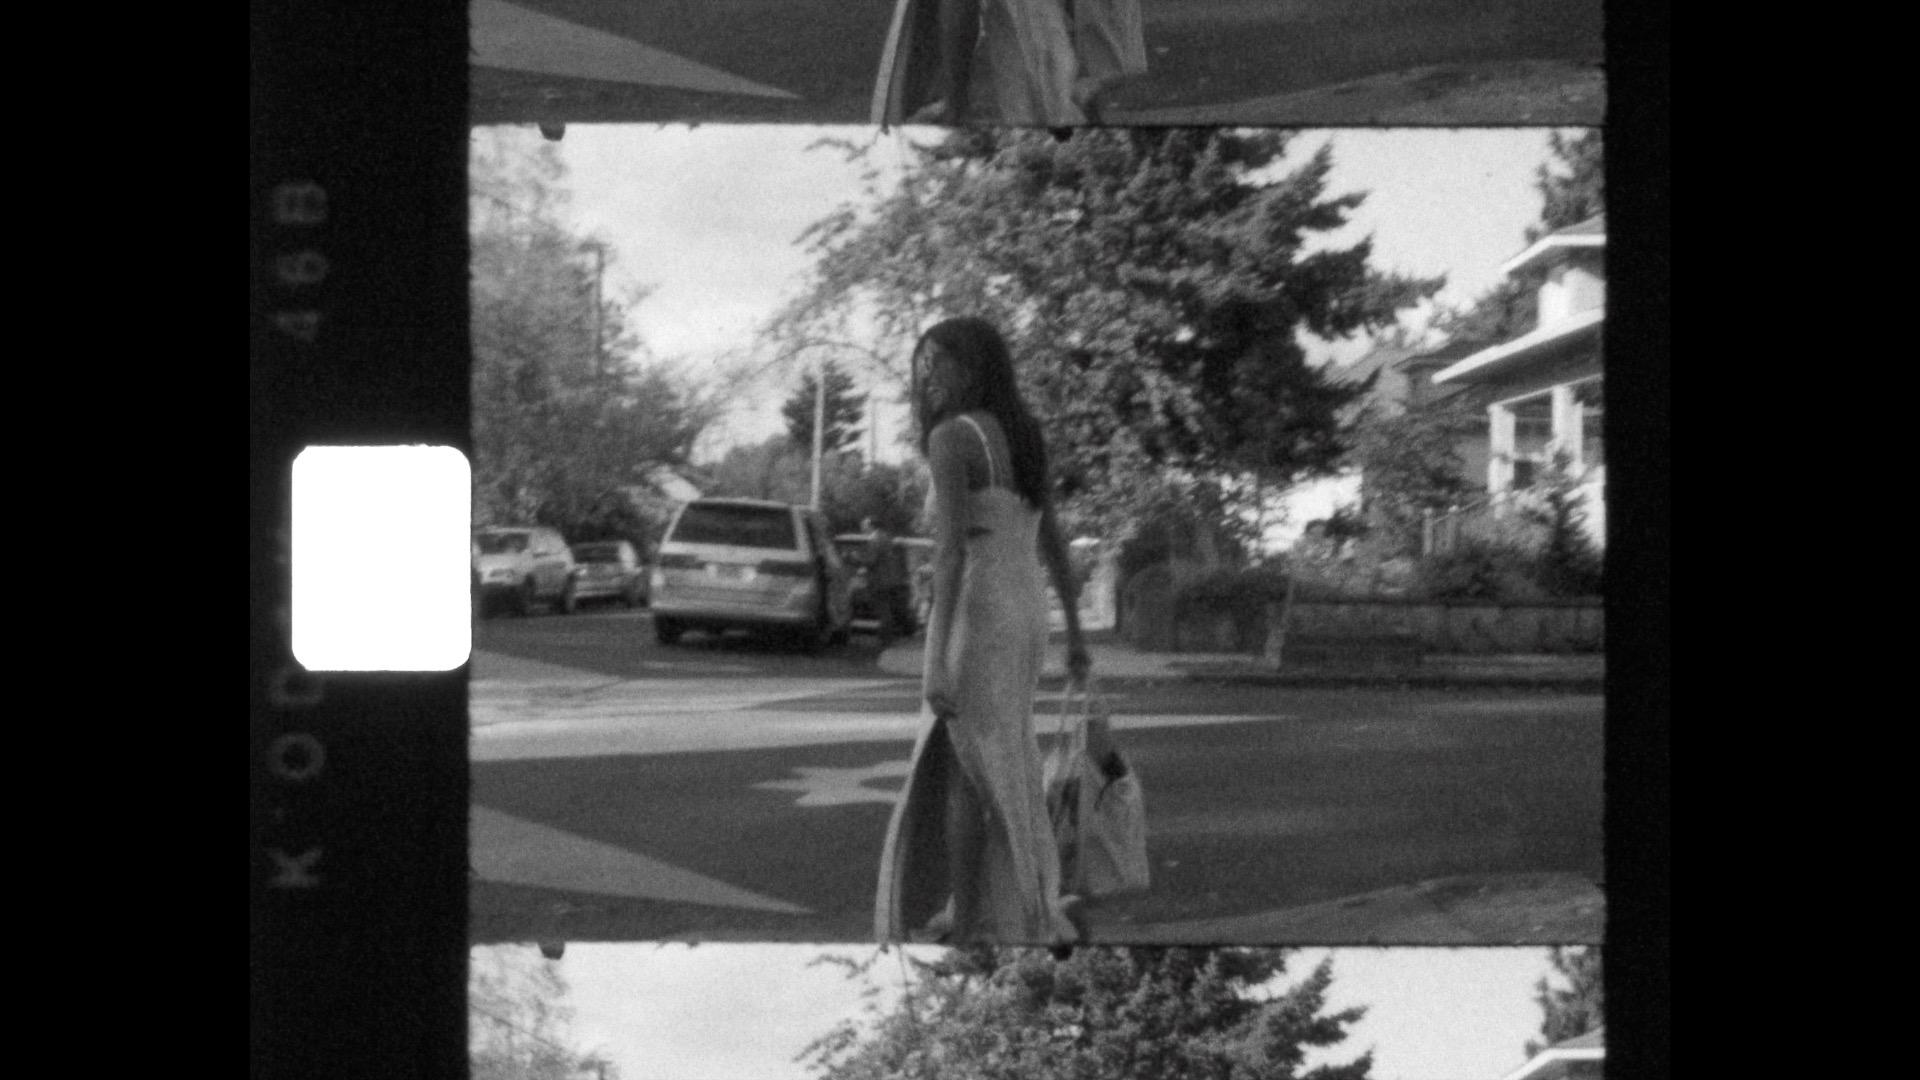 SUPER_8_FILMS1012.JPG